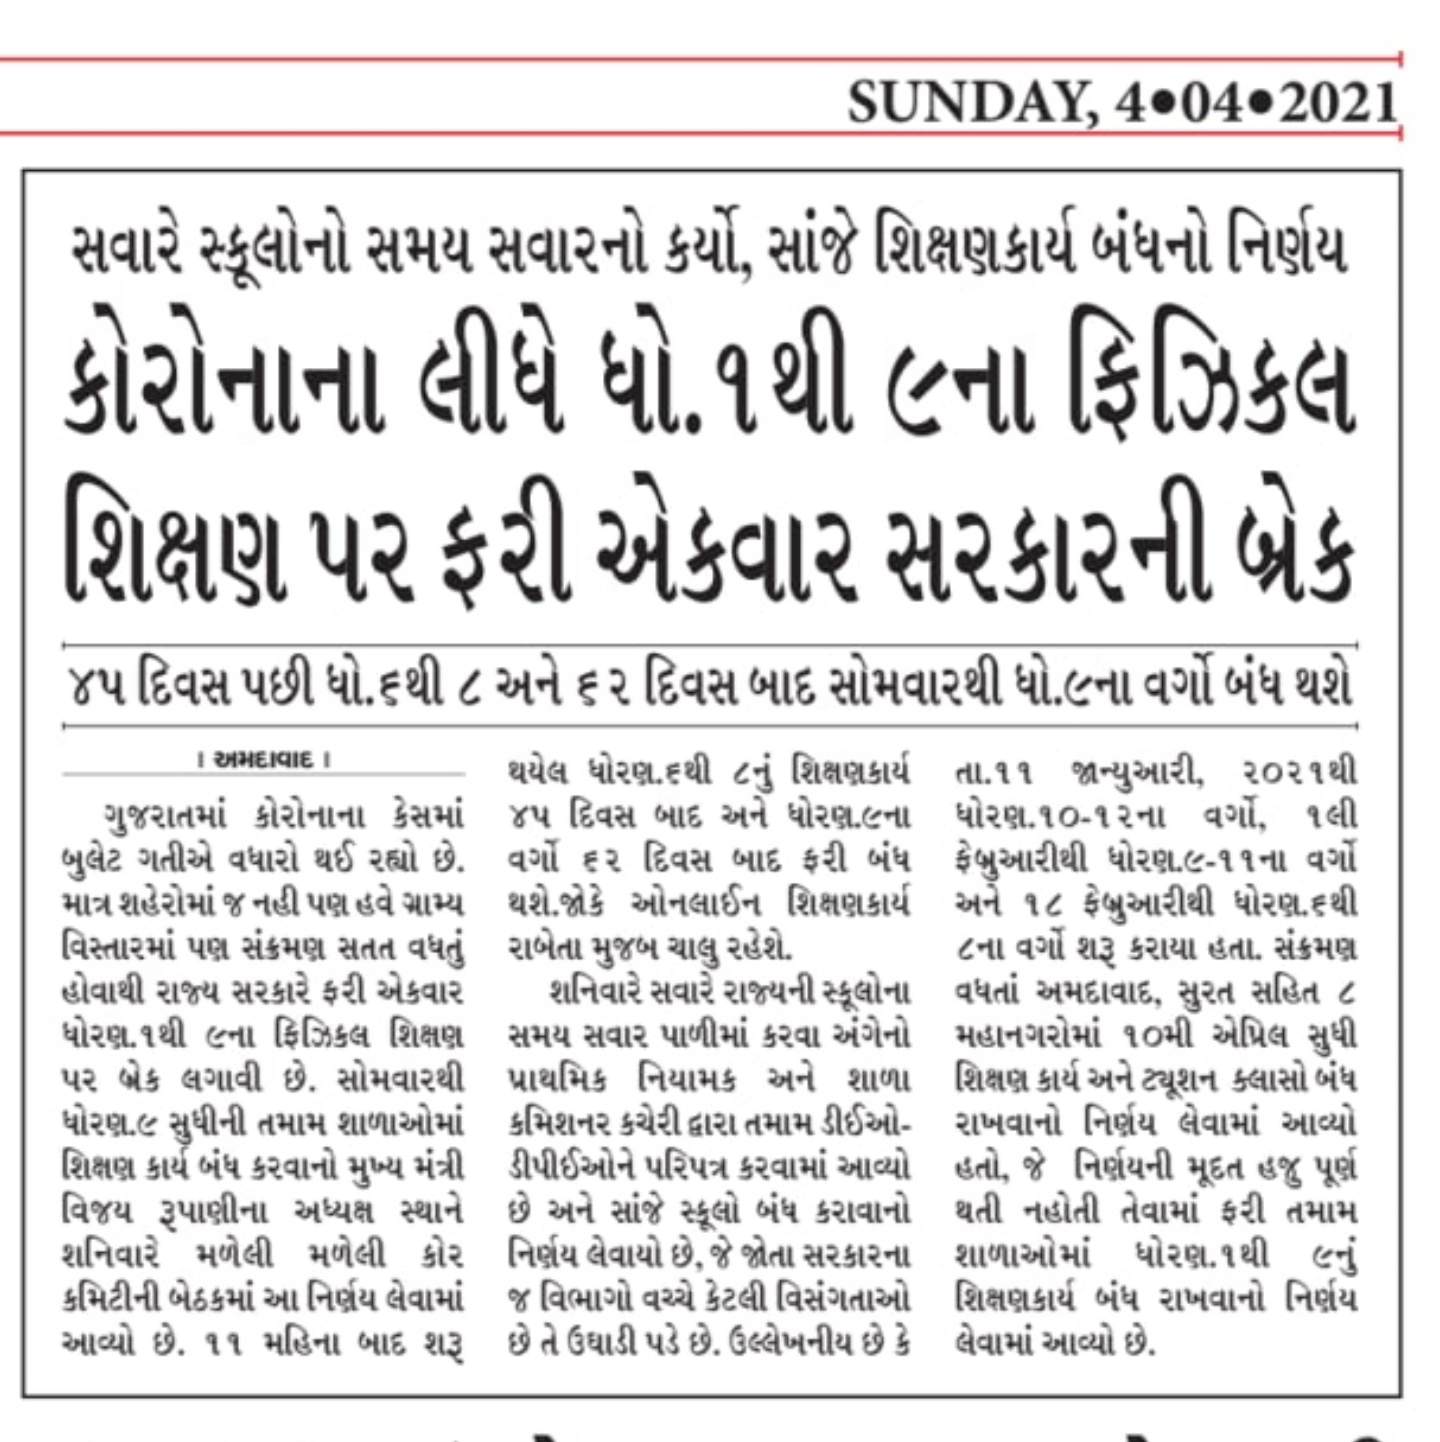 http://www.pravinvankar.in/2021/04/order-to-keep-all-schools-of-gujarat.html